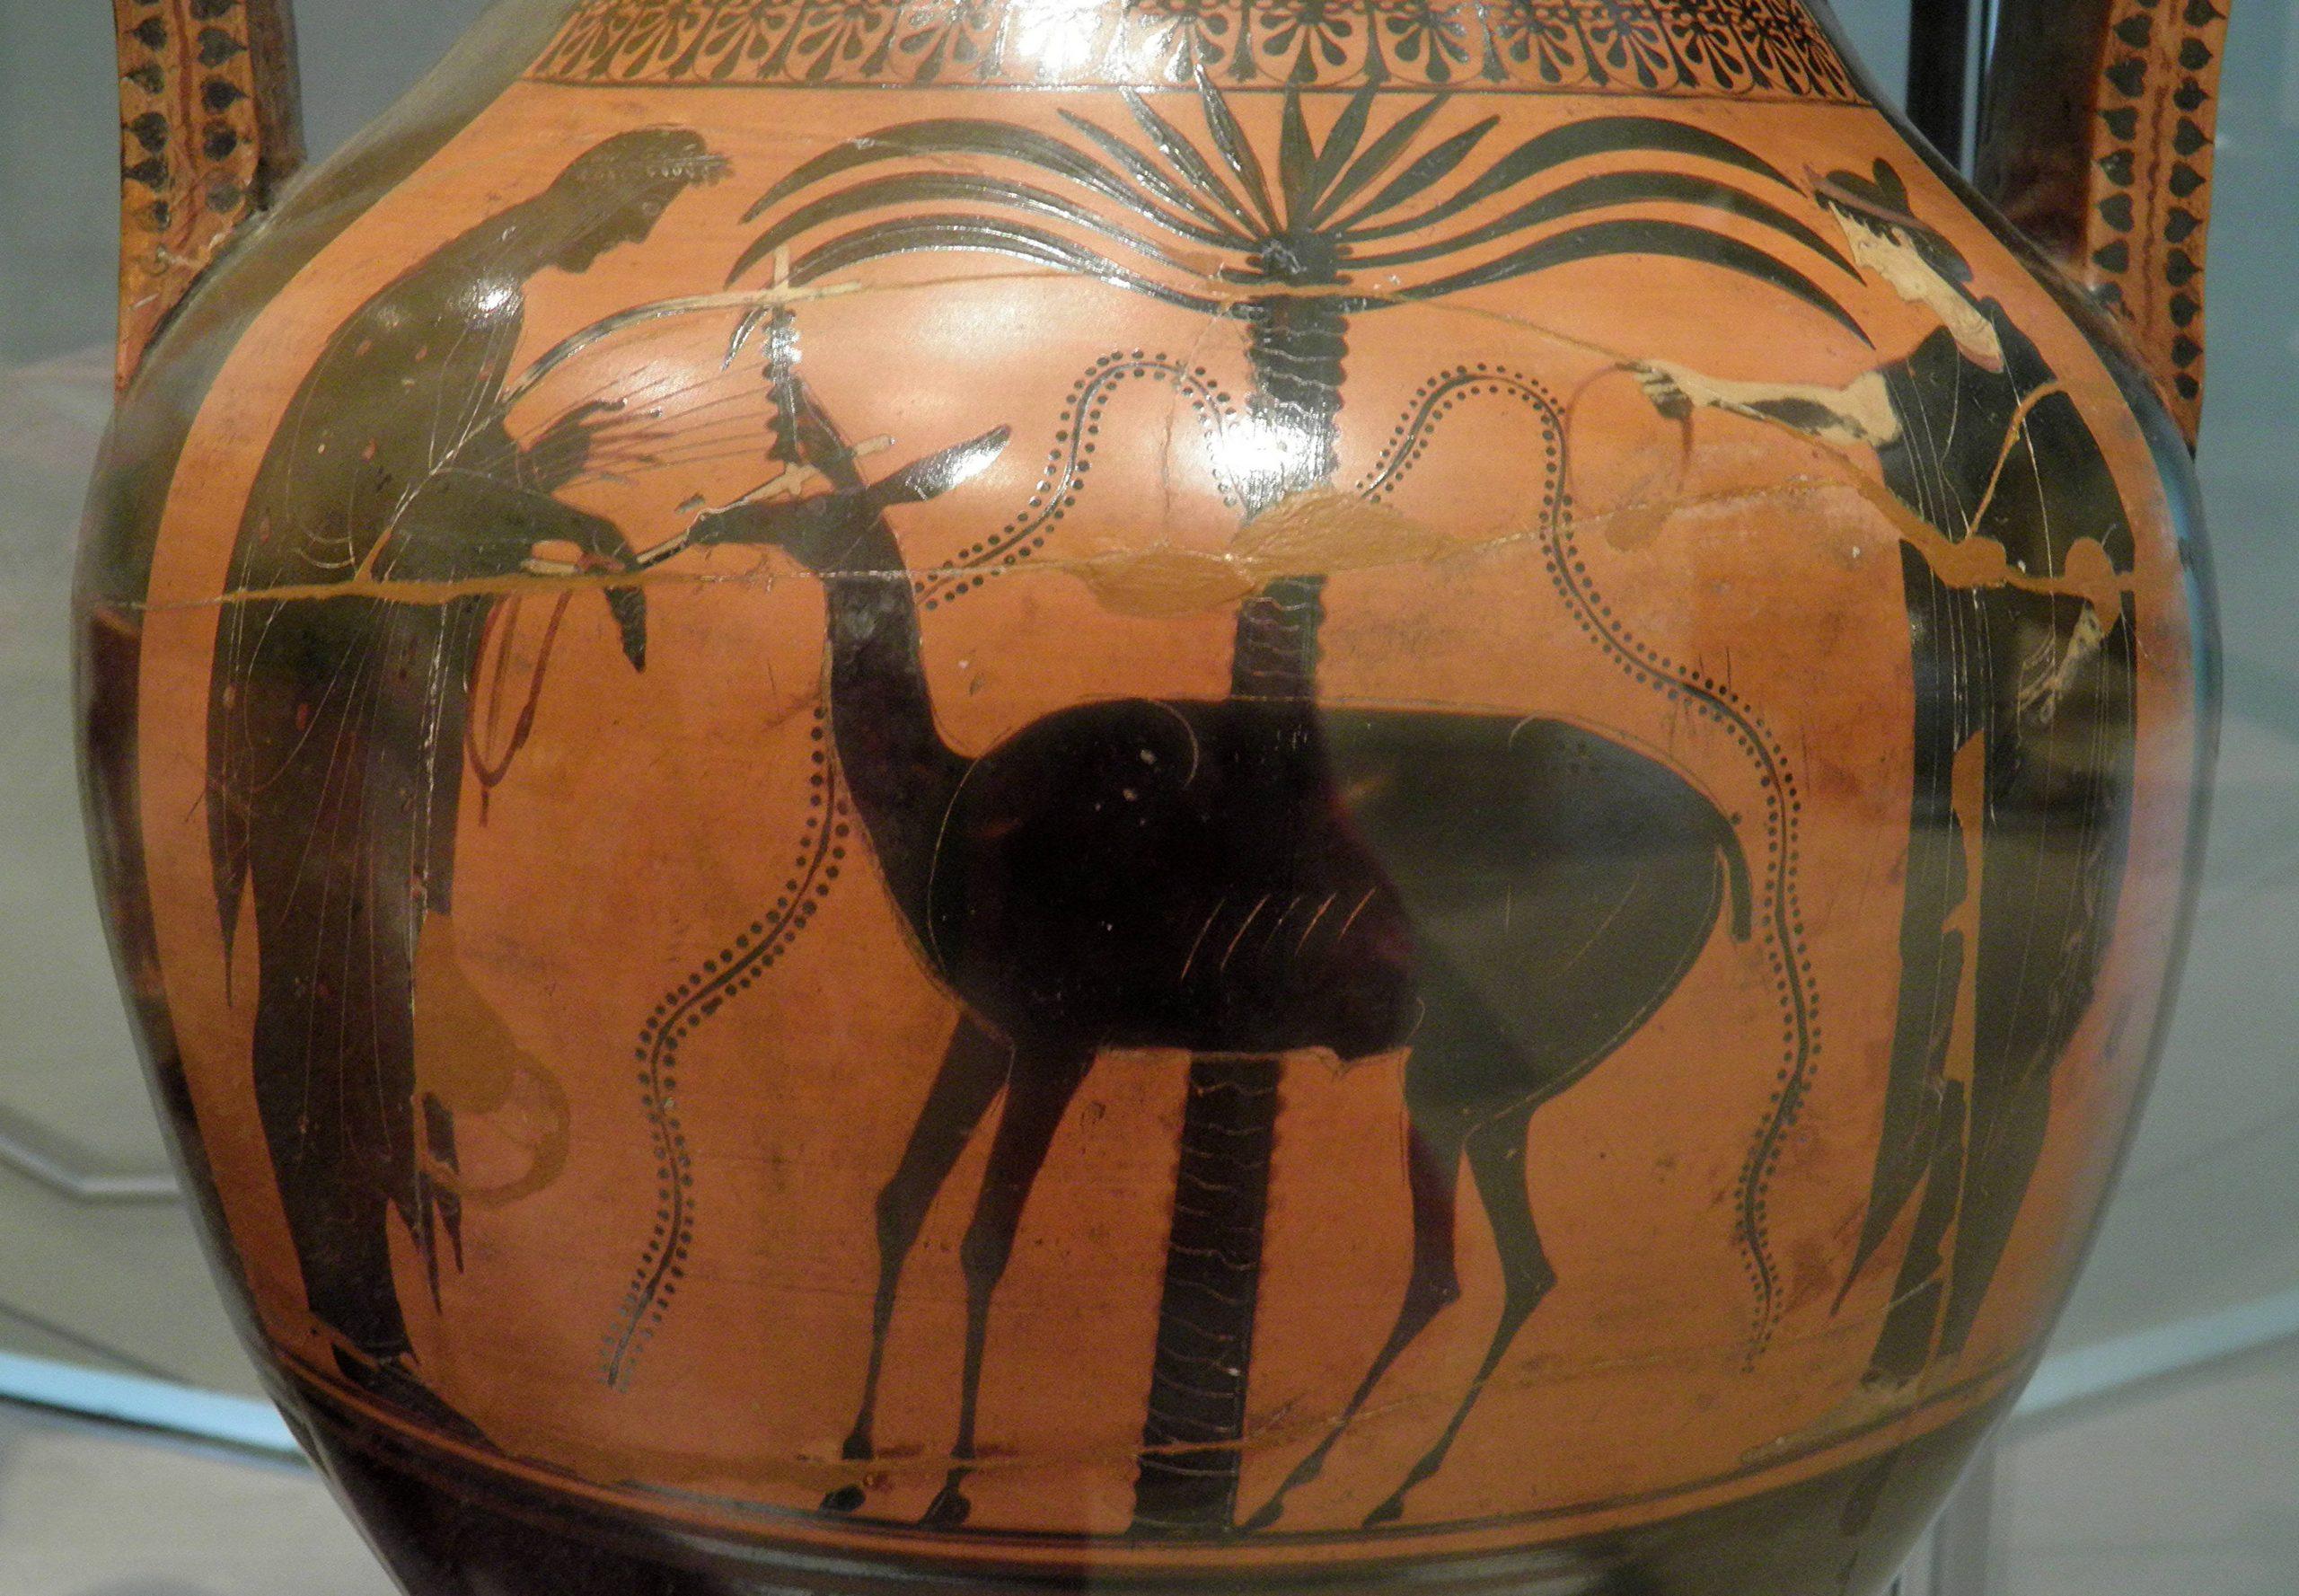 Athenian black-figure amphora showing Apollo, Leto, and an elegant deer with a palm tree (Ashmolean Museum, courtesy wikimedia)